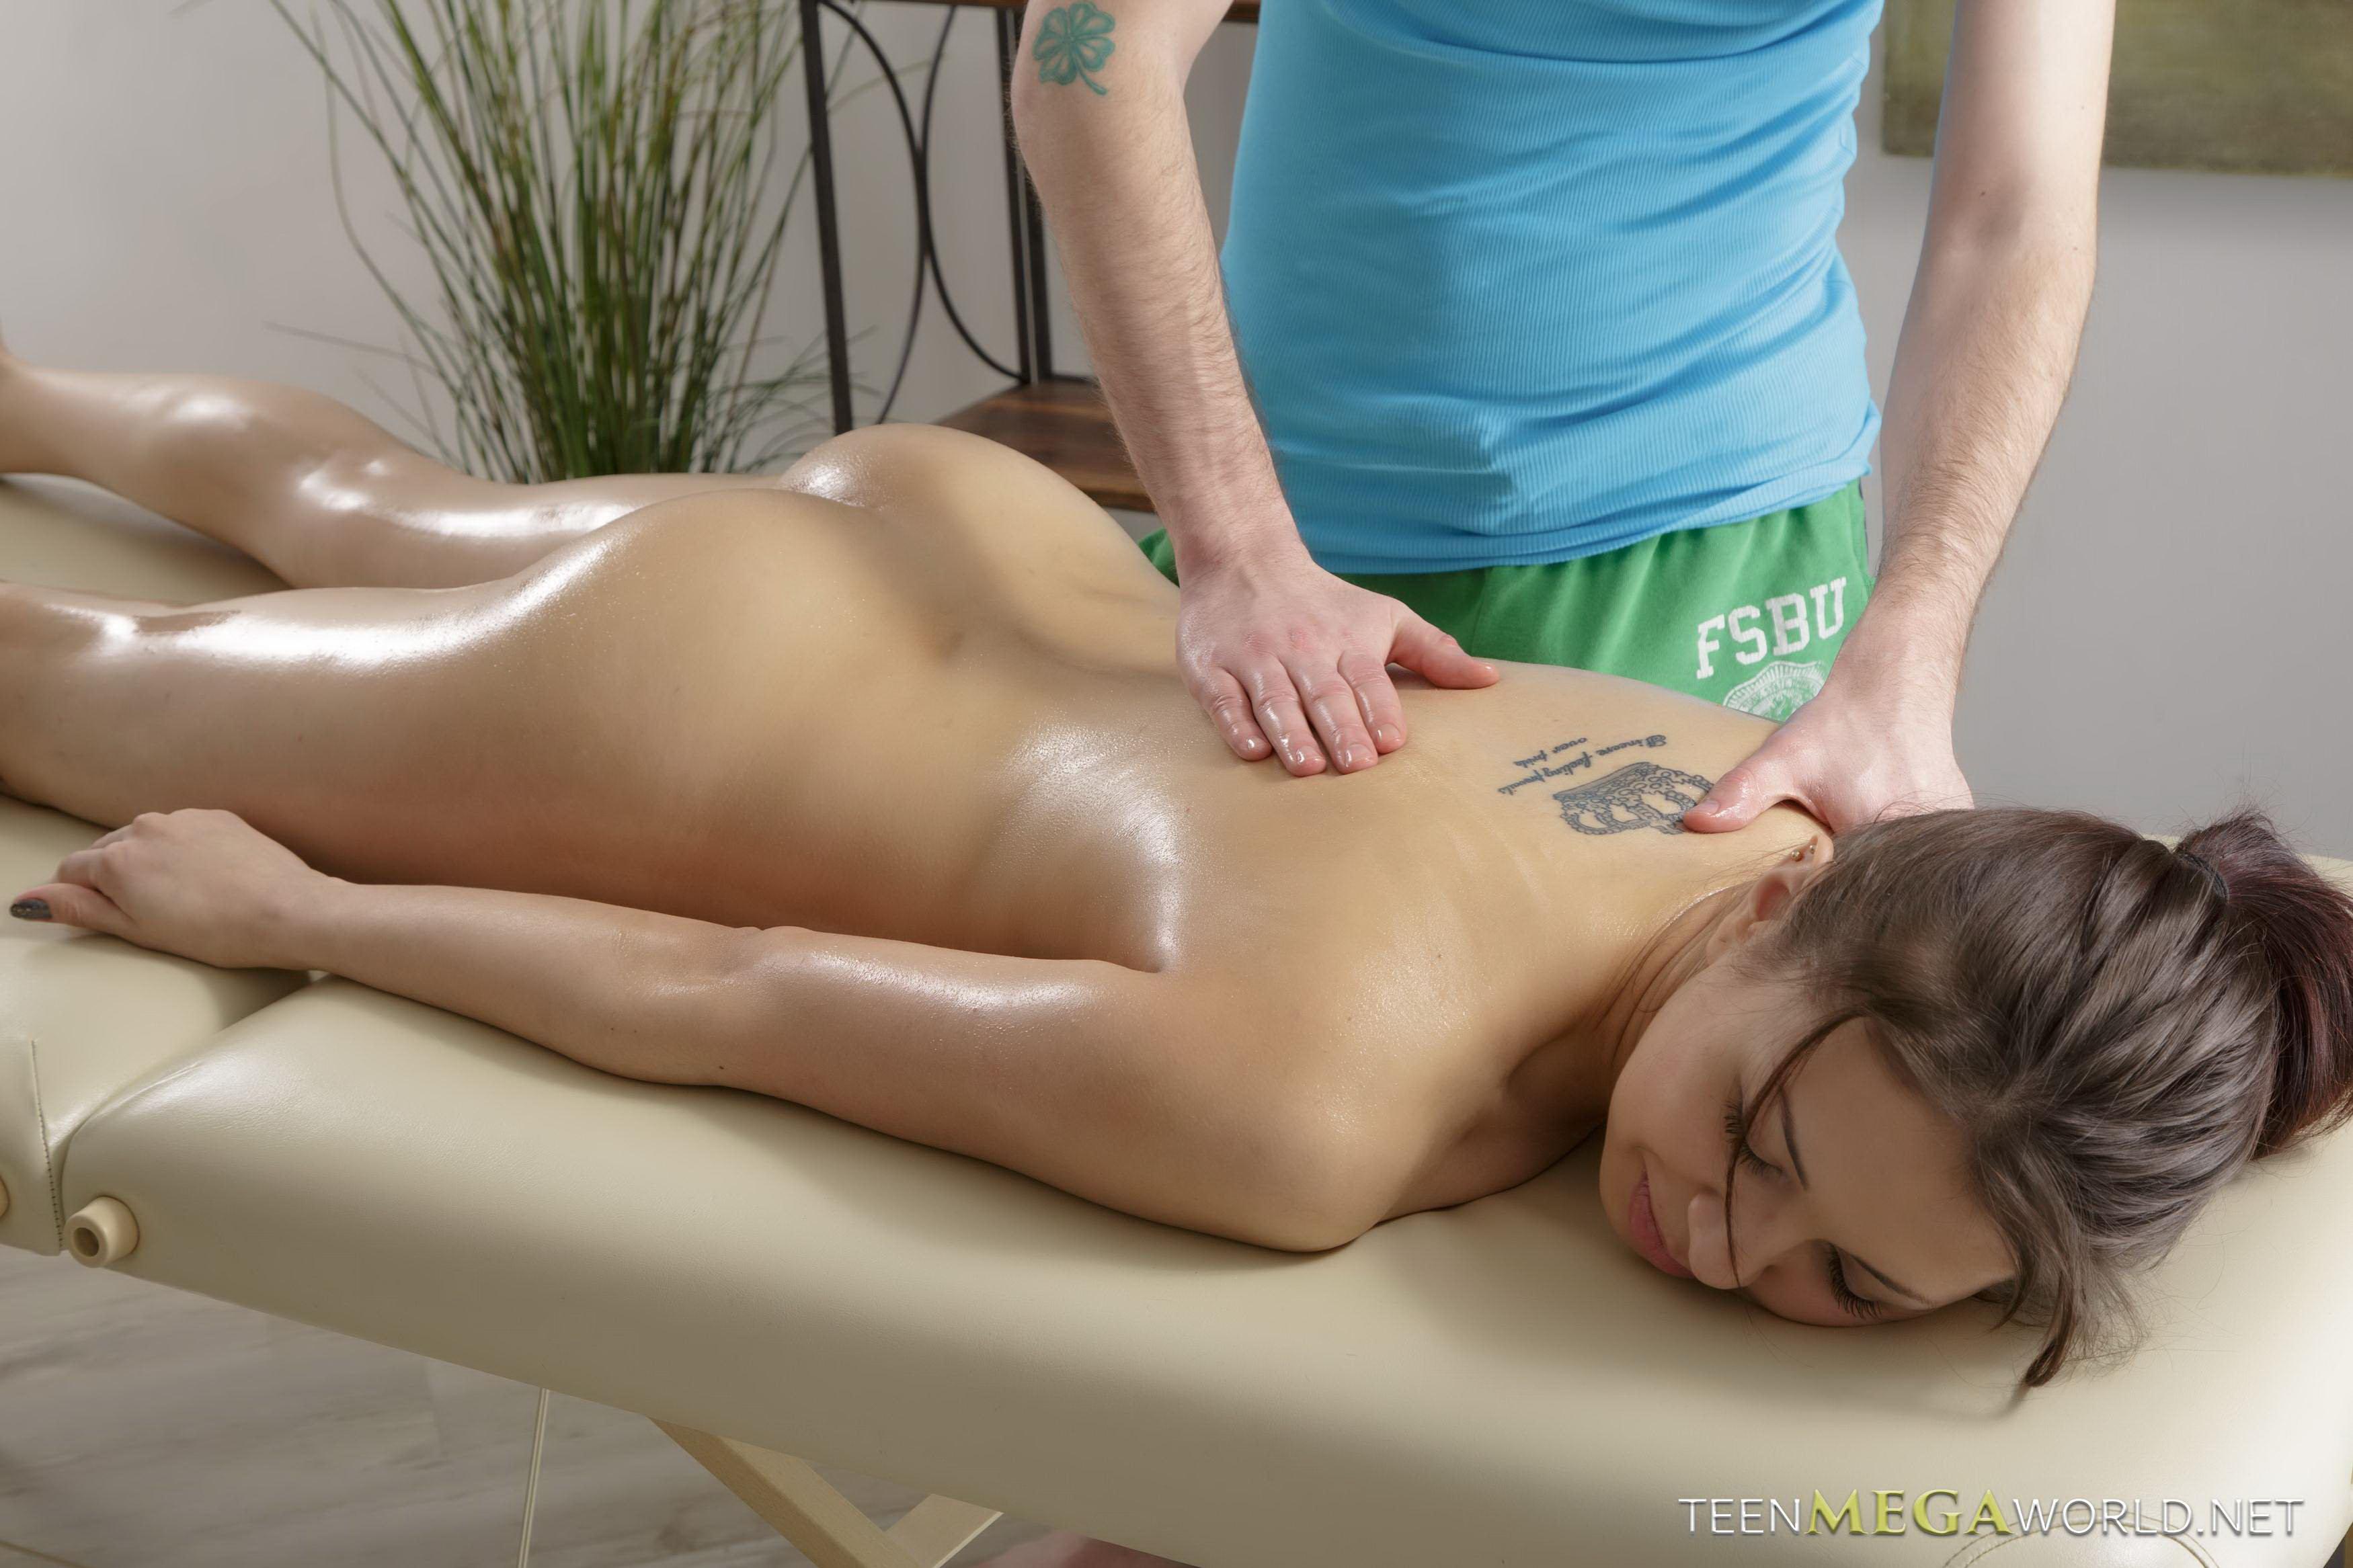 Ingles In Erotic Calgary Massage Khaos